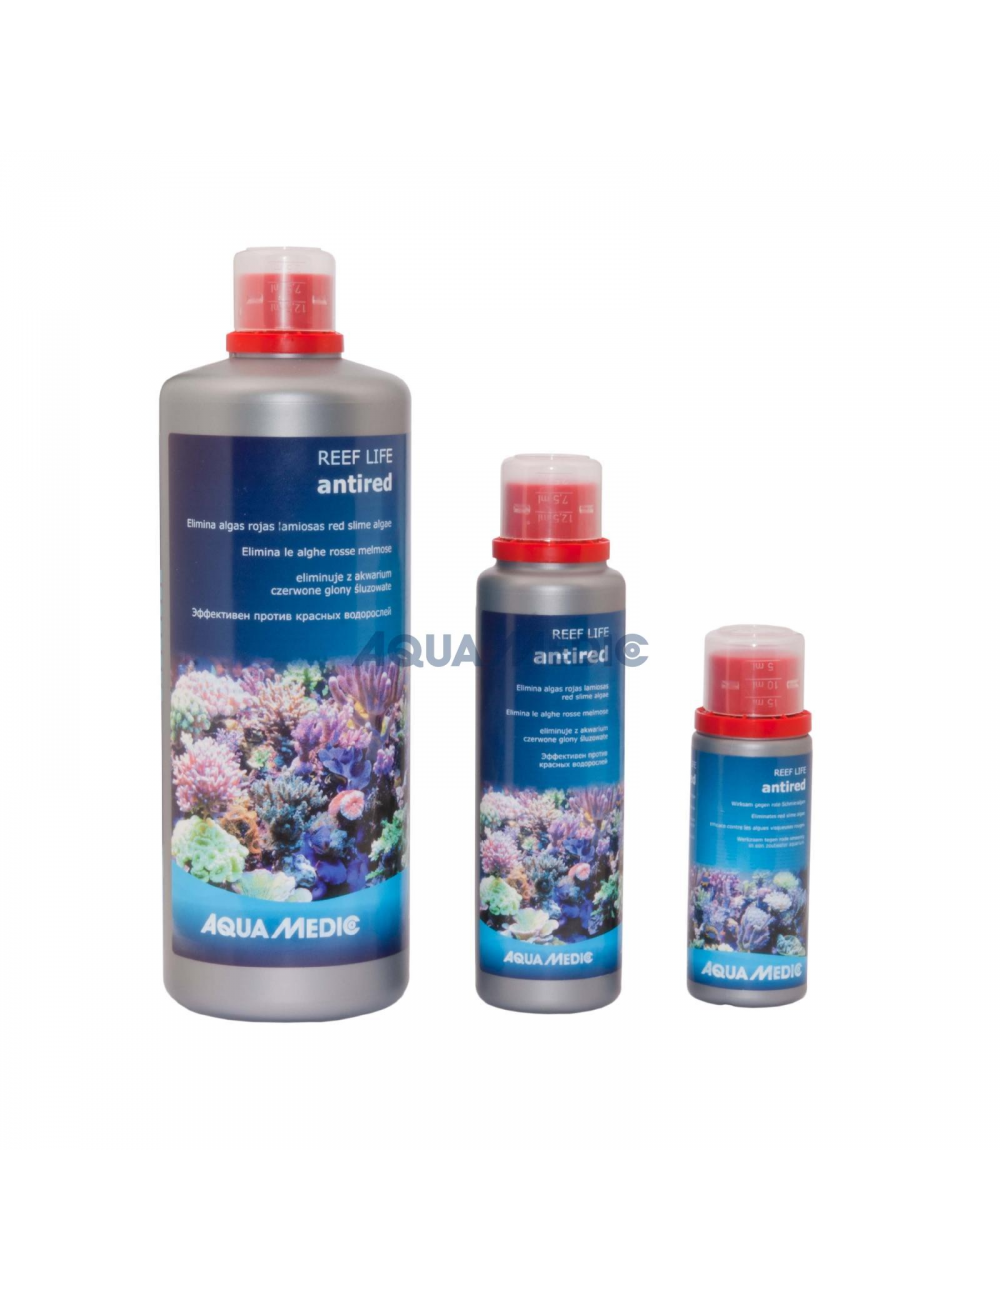 AQUA-MEDIC - REEF LIFE antired - 250 ml